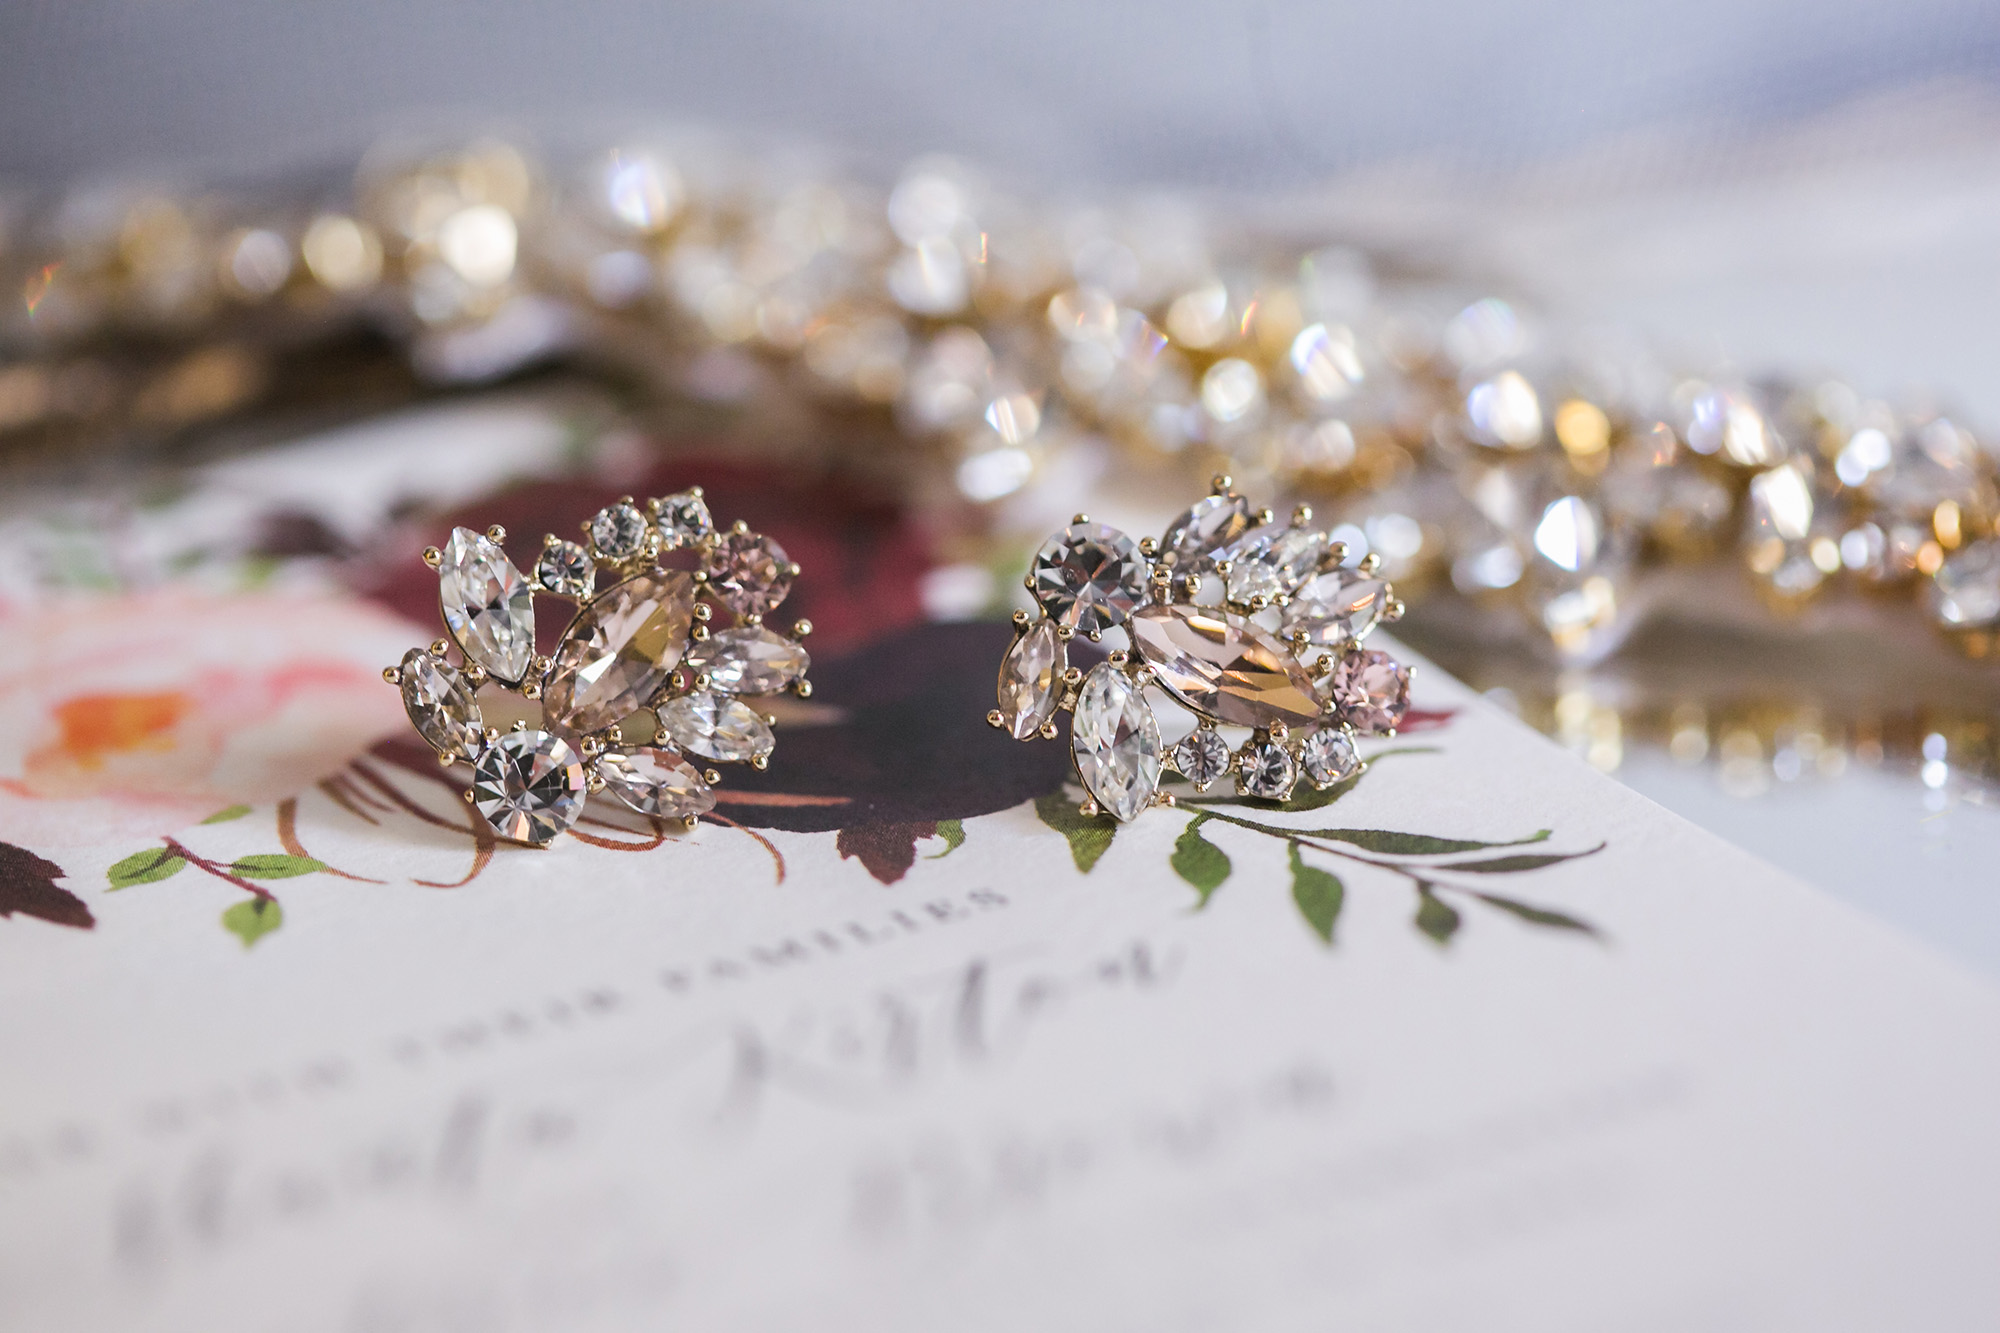 associate-photographer-christmas-house-wedding-carrie-vines-0113.jpg